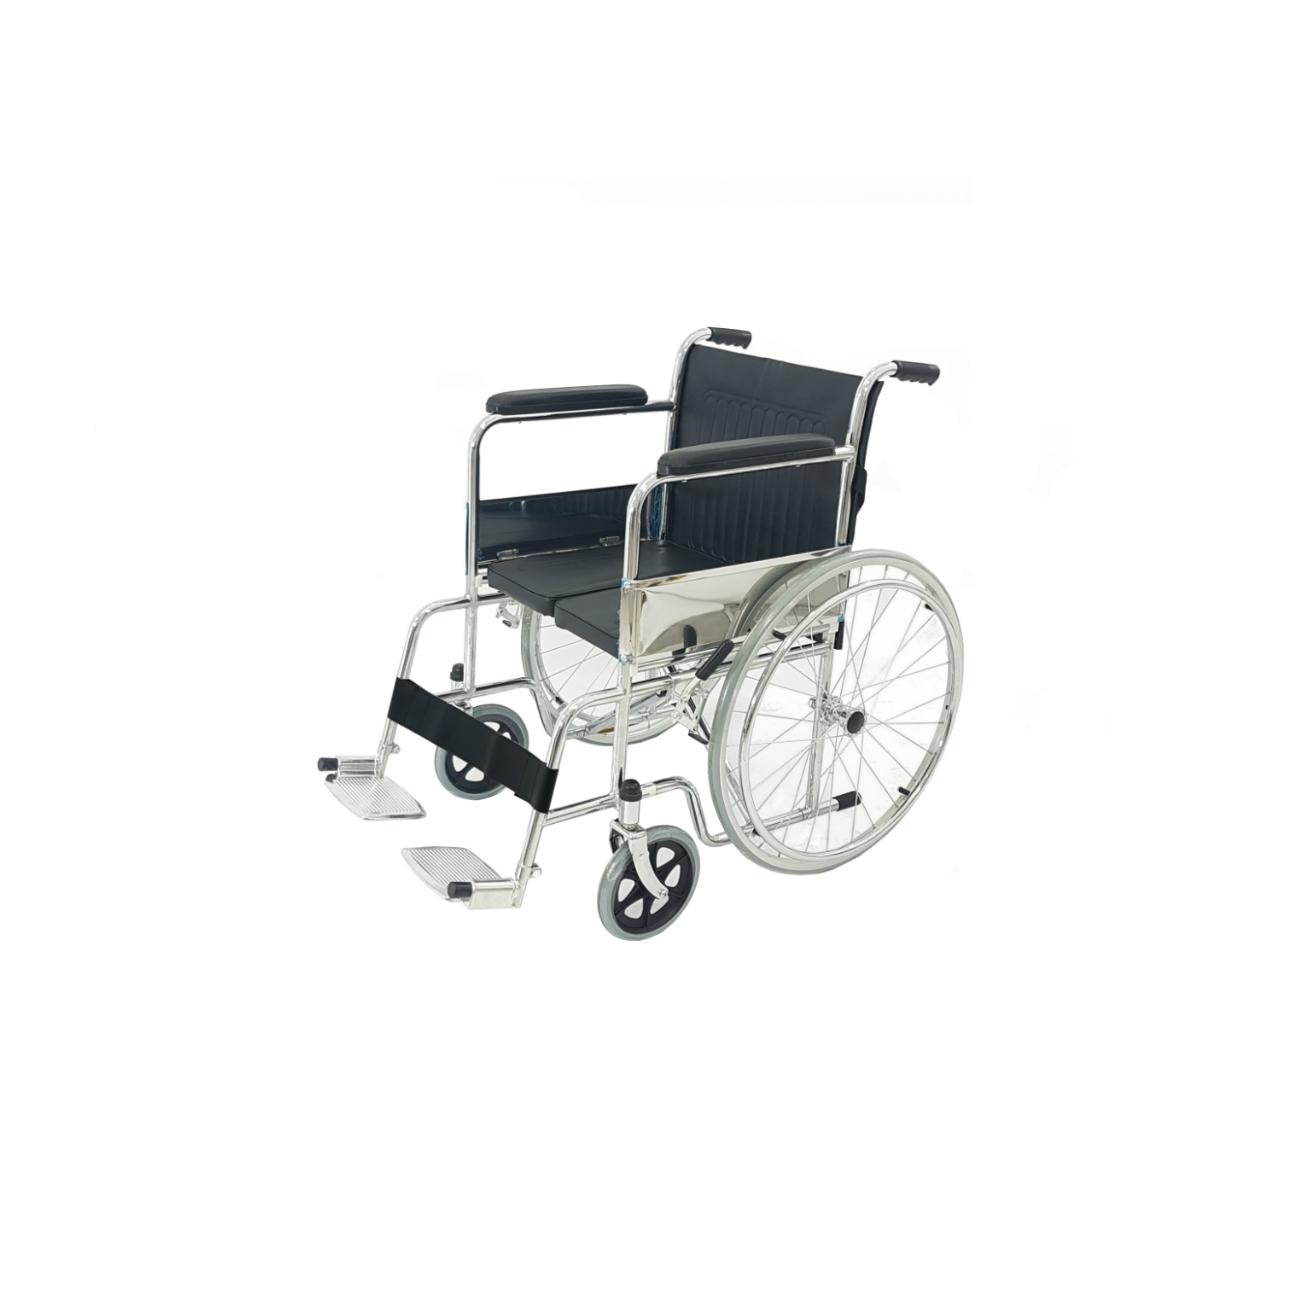 MobilityPlus 07 – aperta